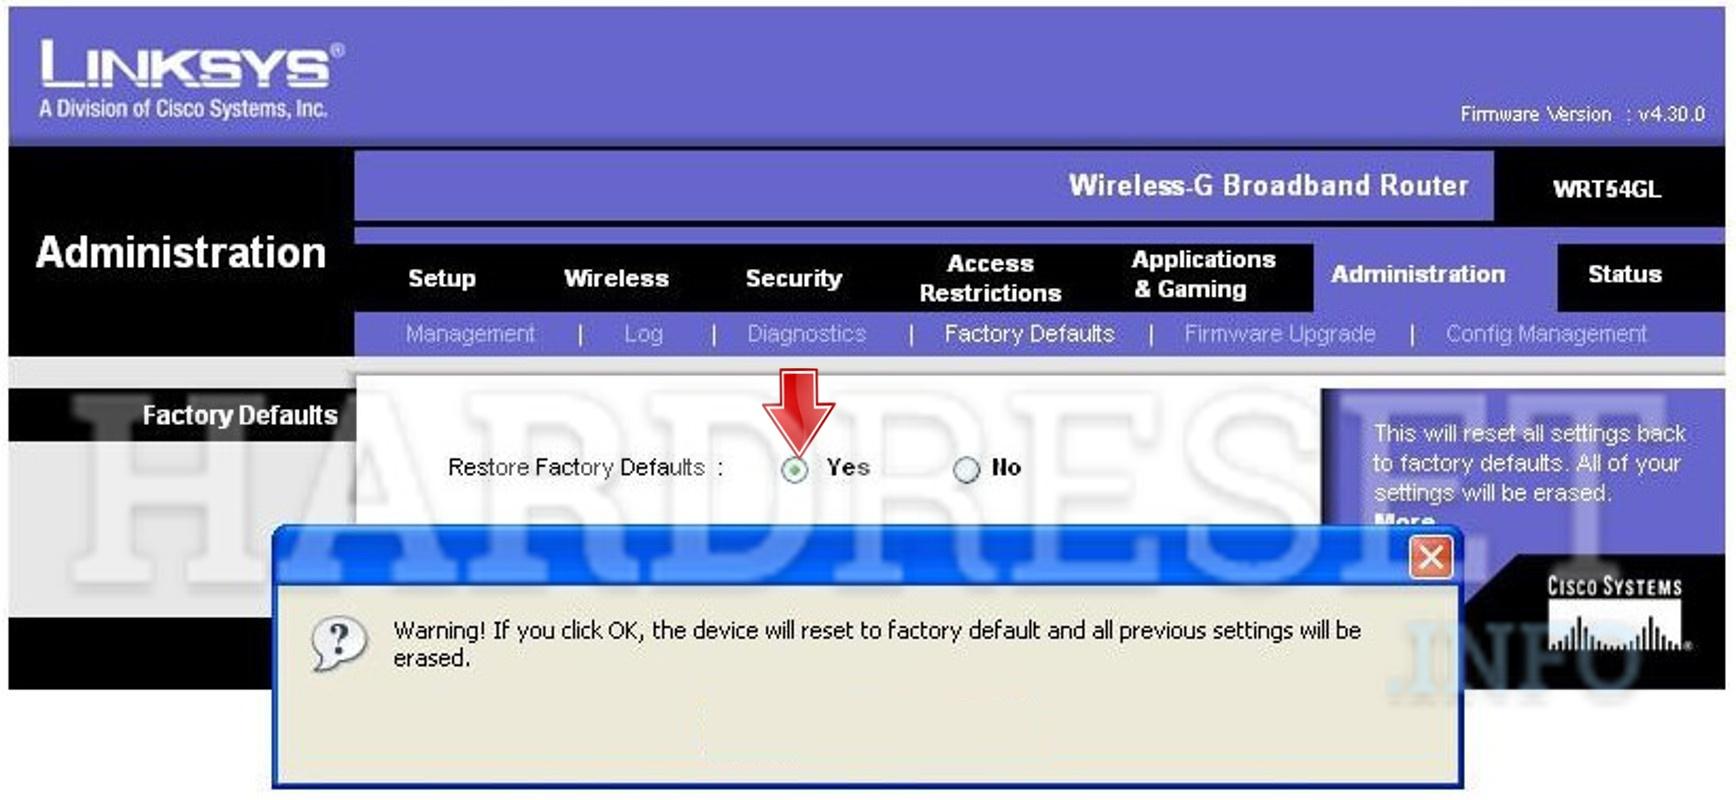 Hard Reset LINKSYS Router - HardReset info